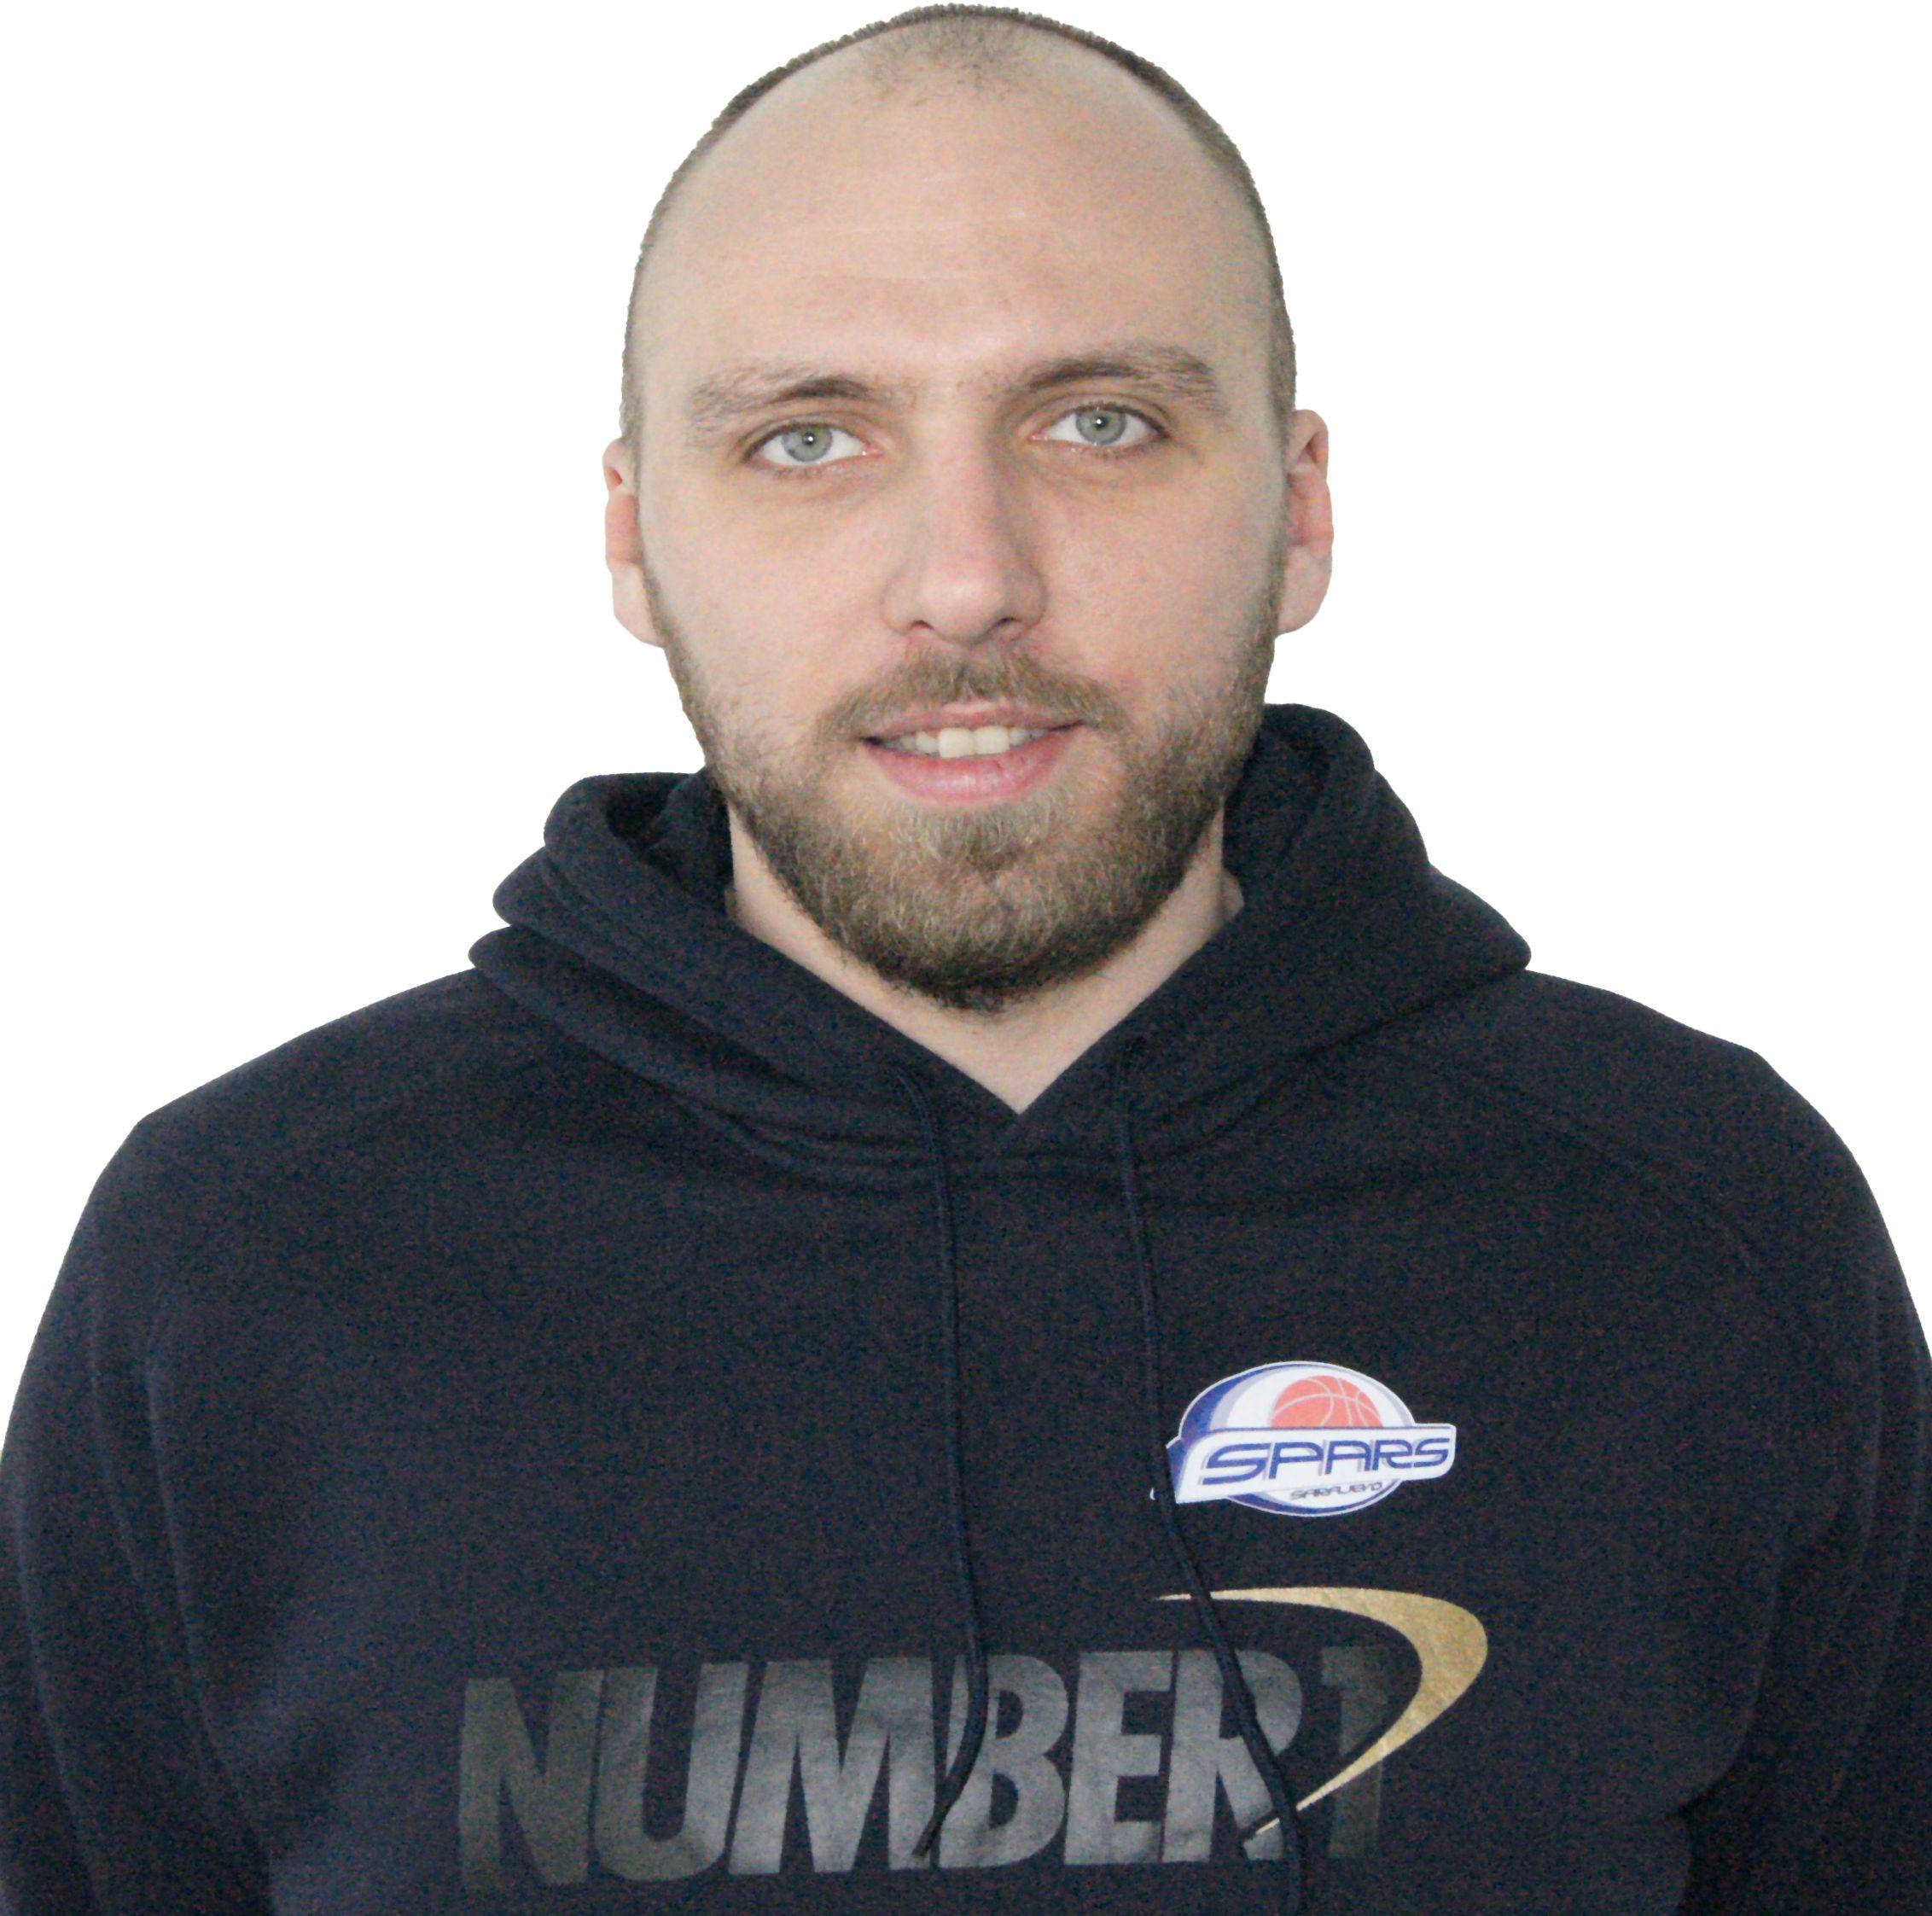 https://kkspars.com/web/wp-content/uploads/2021/09/Mahir-Ferhatbegovic-1.jpg